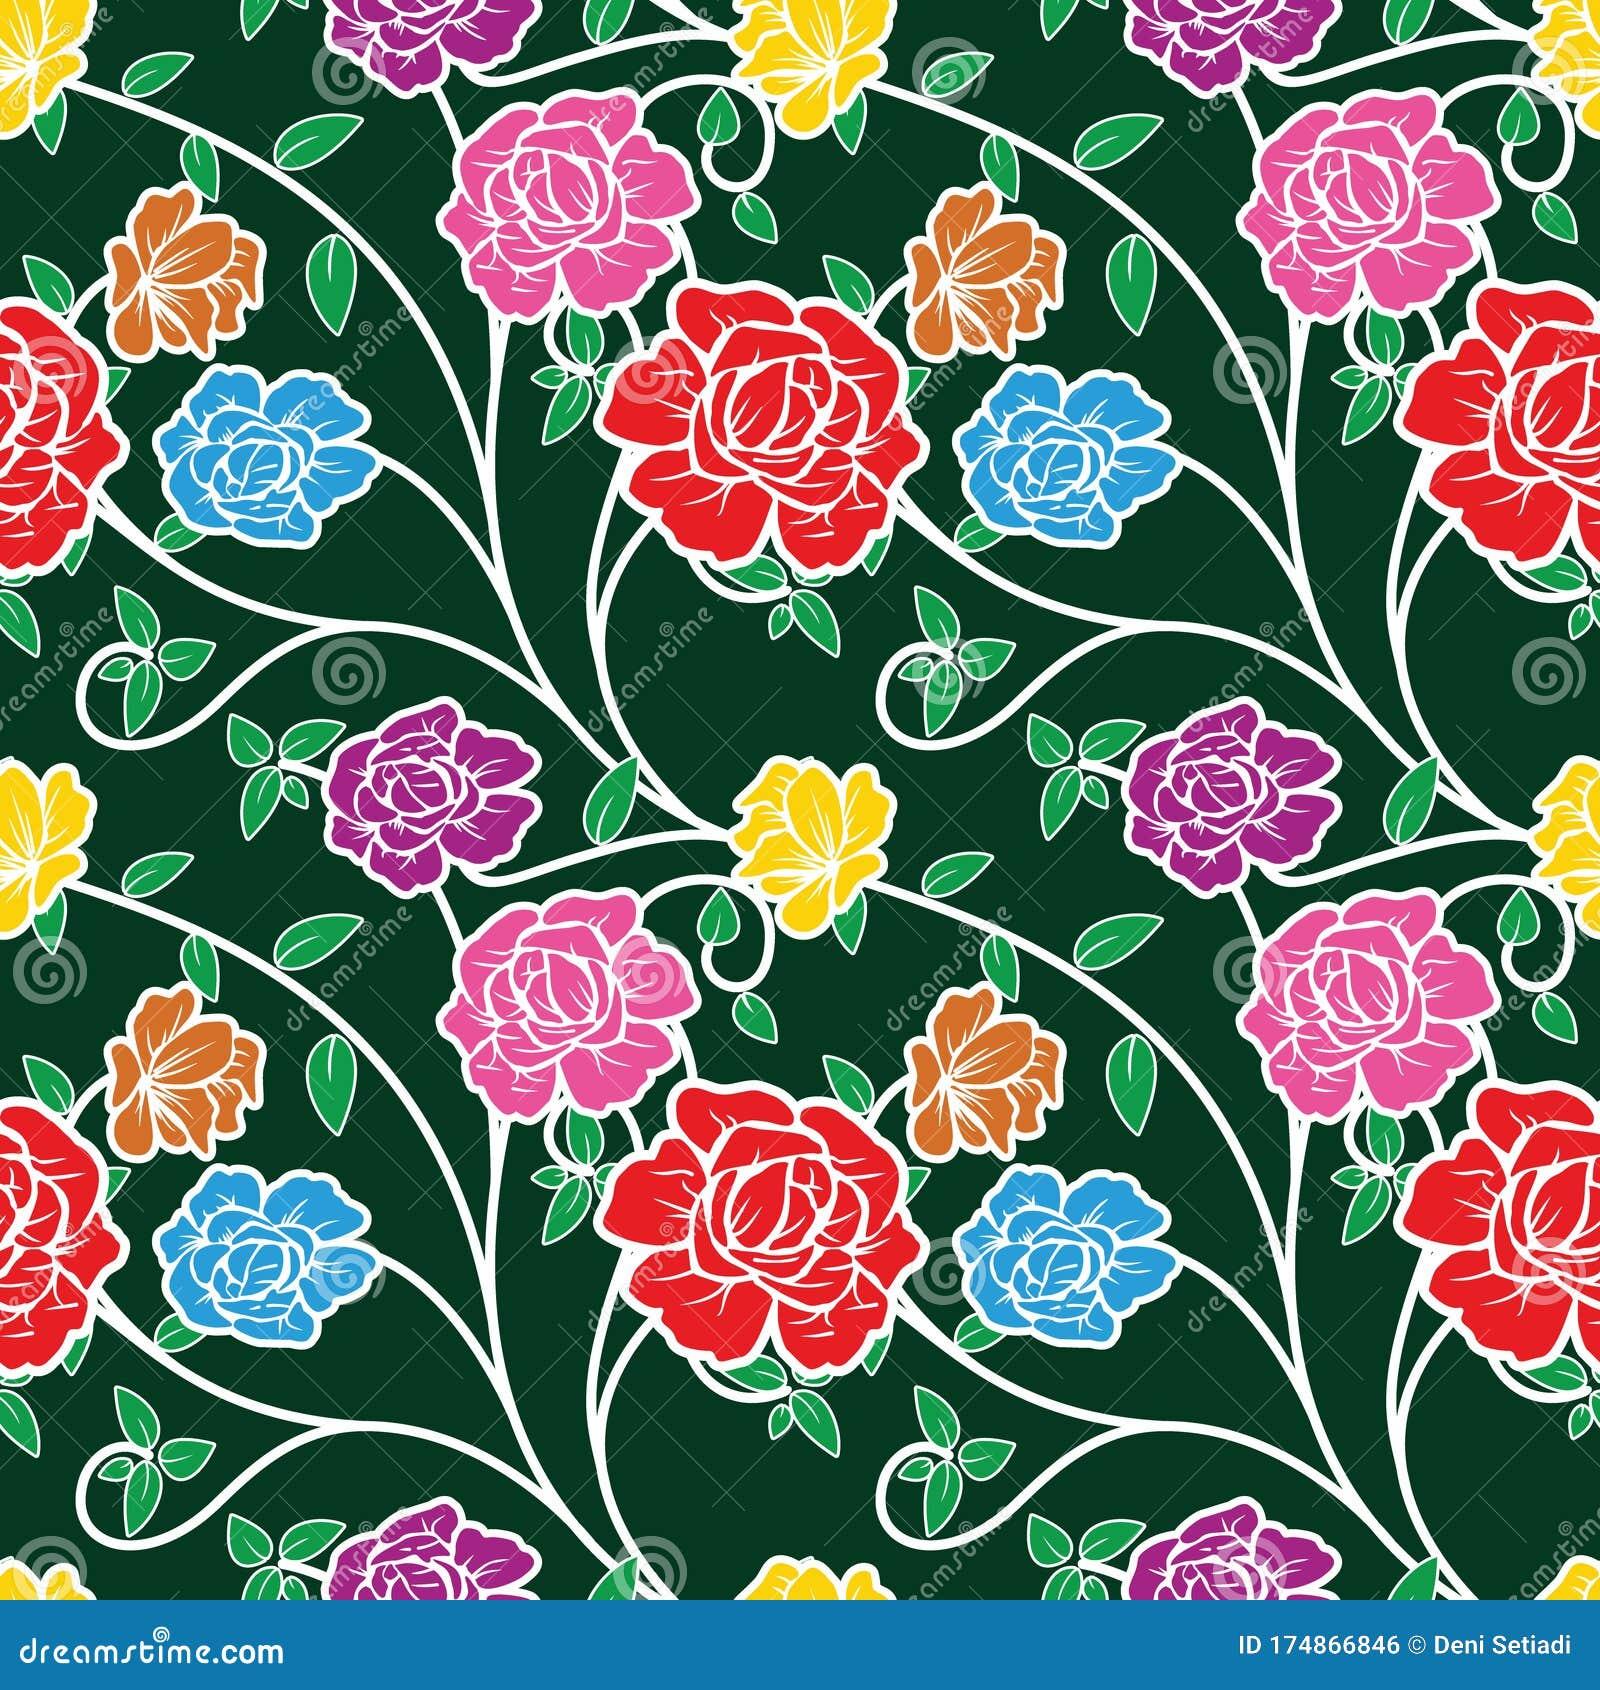 Seamless Pattern with Floral Illustration, Batik Motif Vector ...